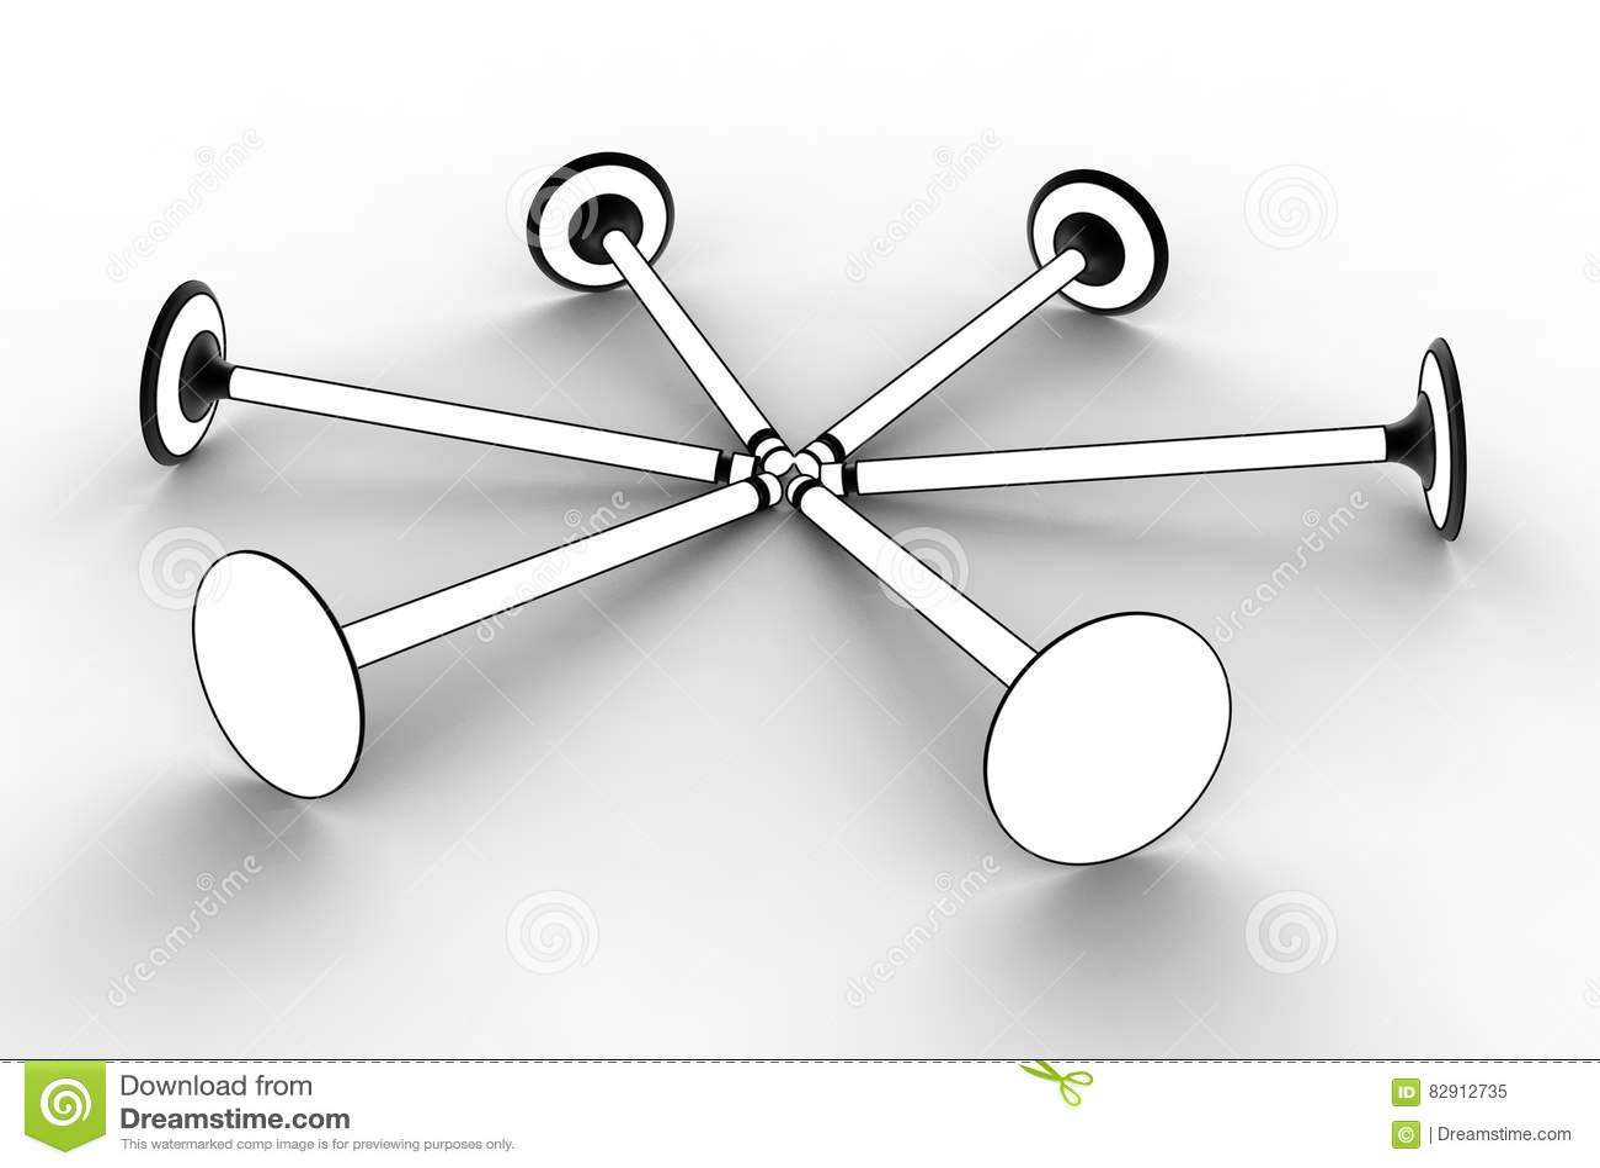 3d Illustration Of Engine Valves Stock Diagram